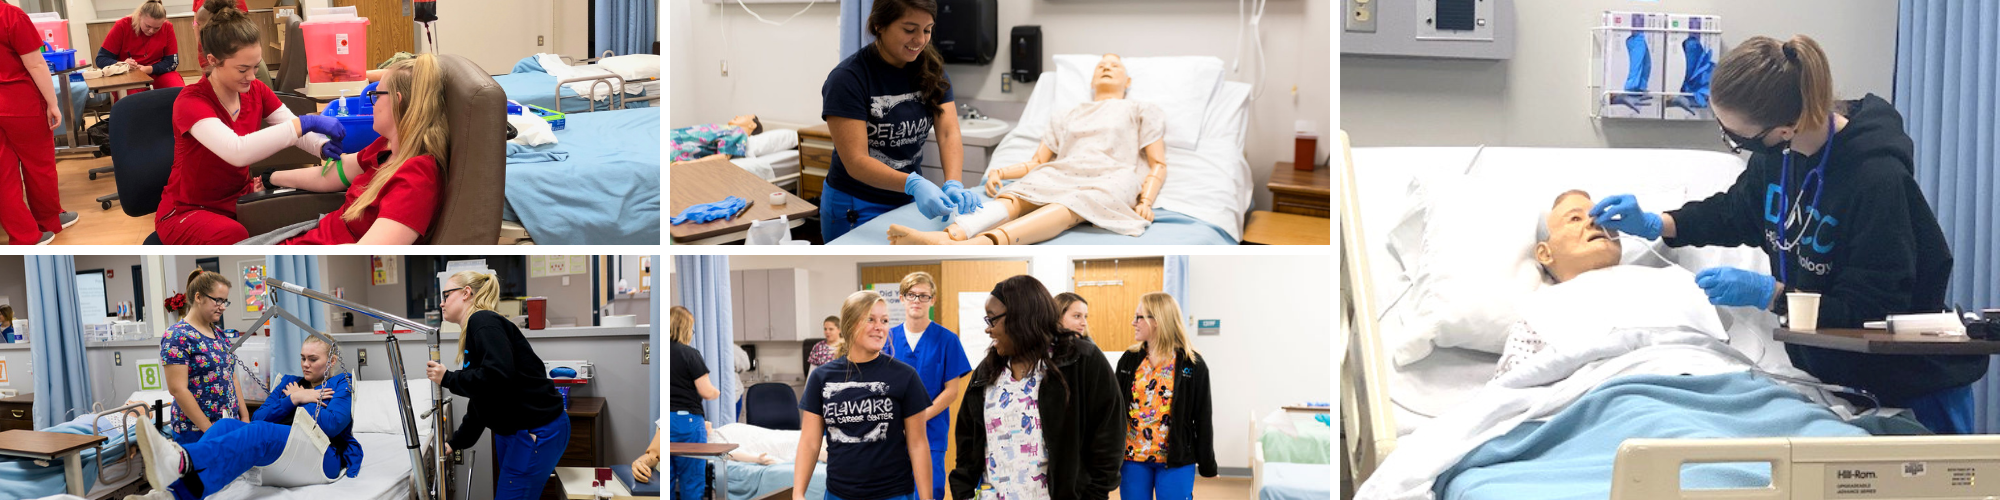 Health Technology and Nursing Program